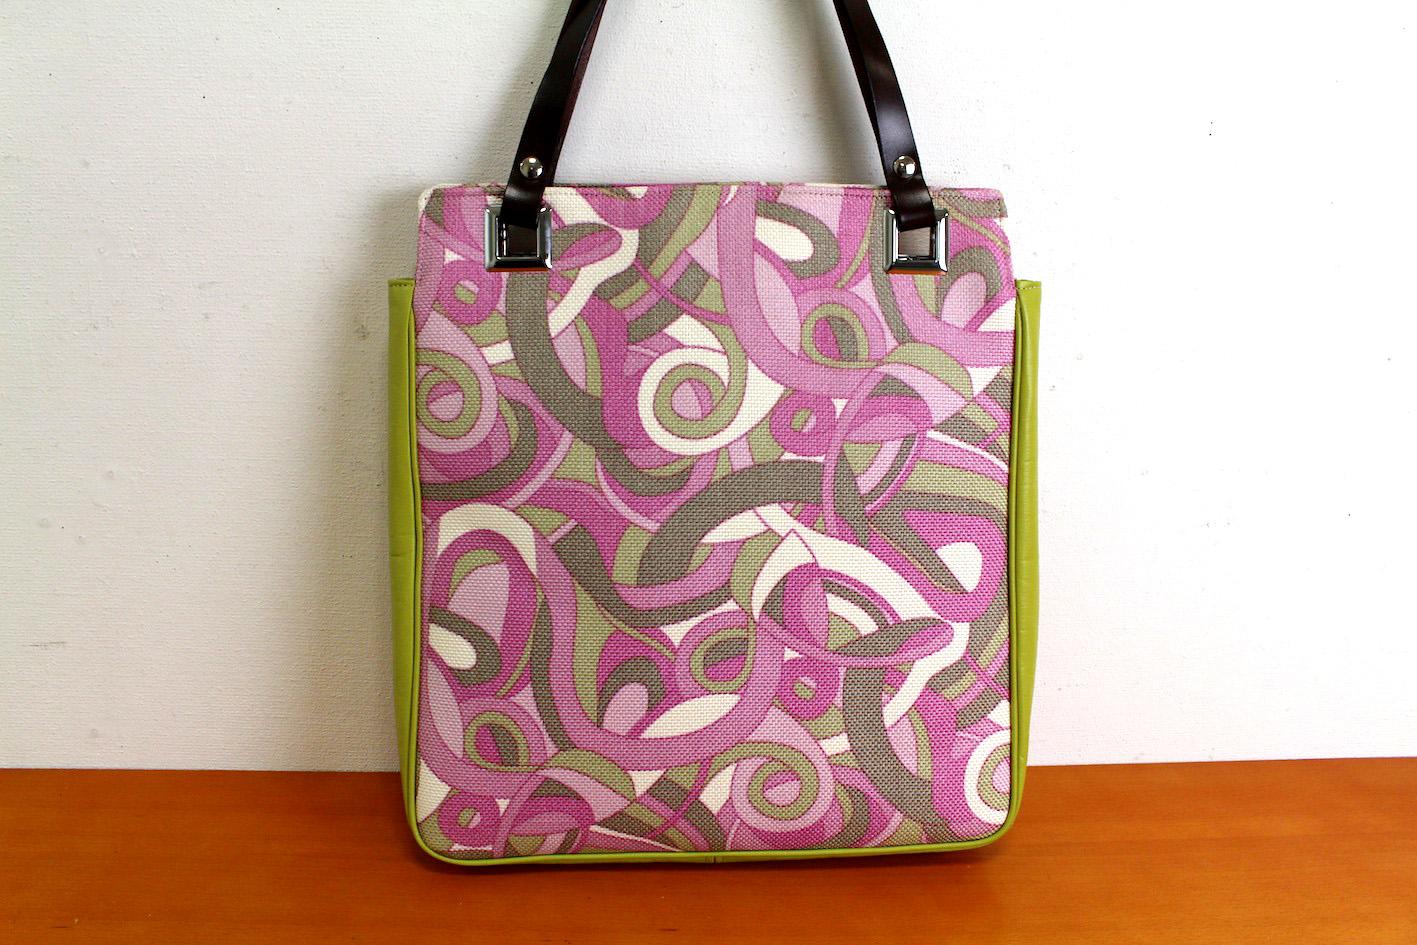 ATSUKO_Tote bag_4(Pink&Green)--1